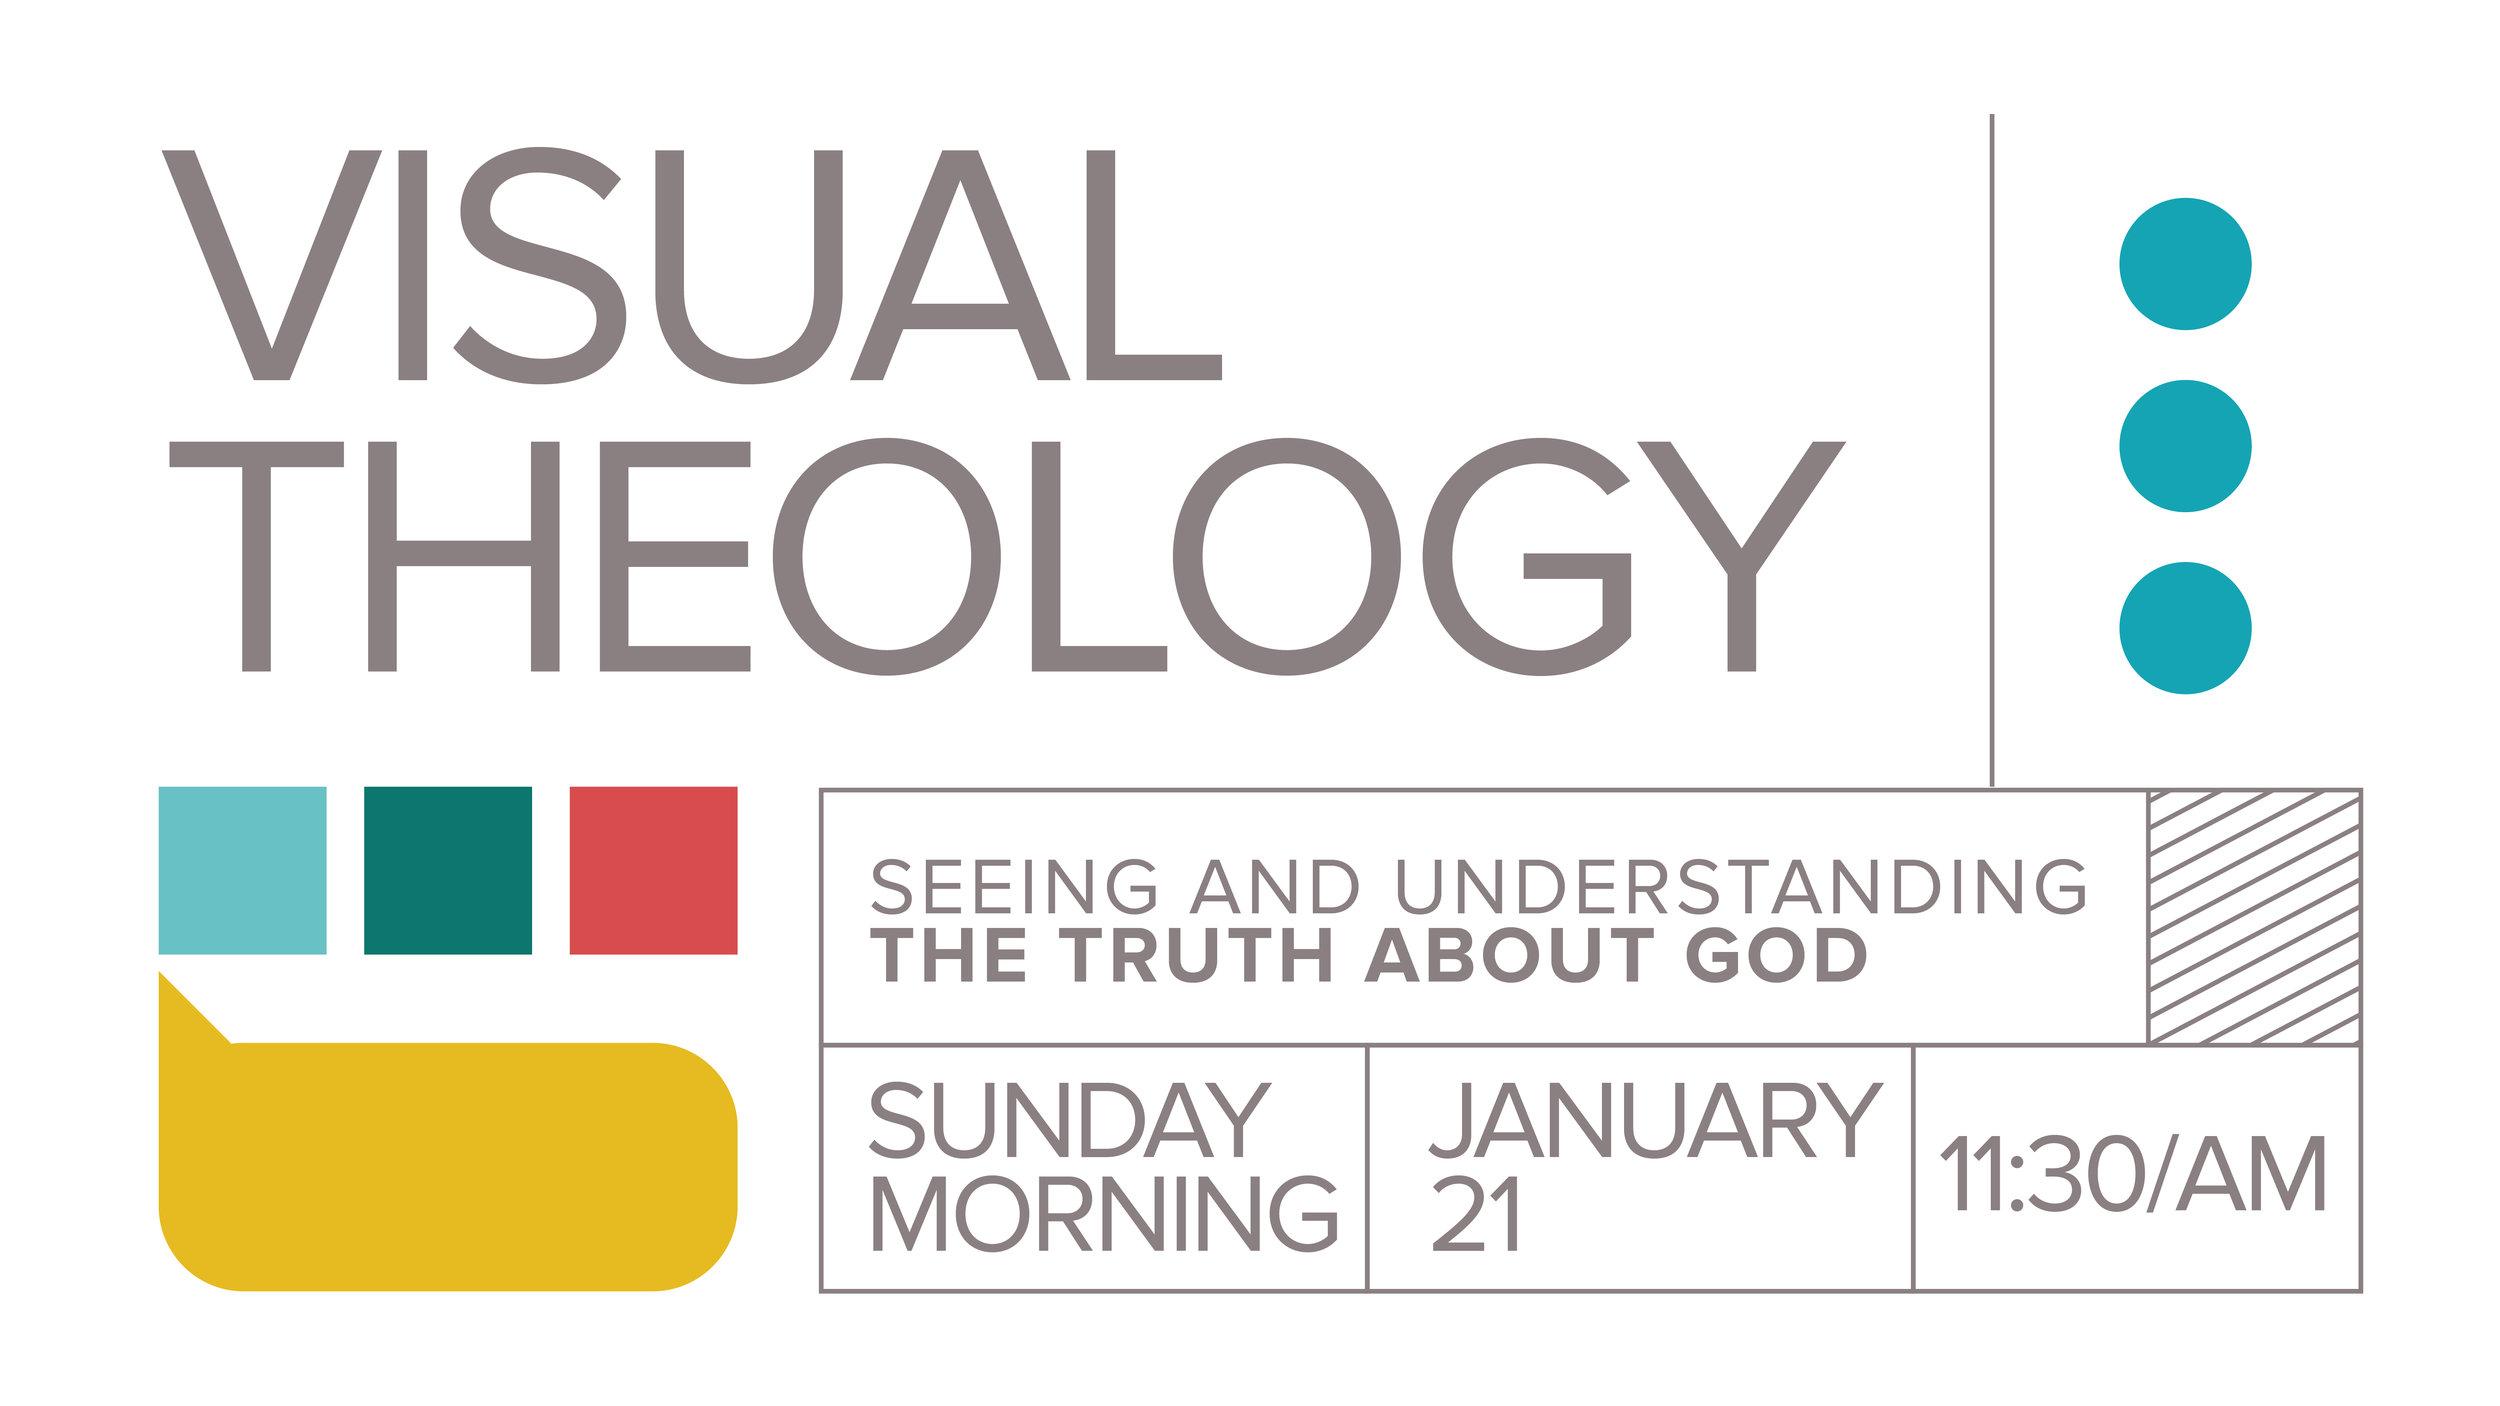 visualtheology-01.jpg